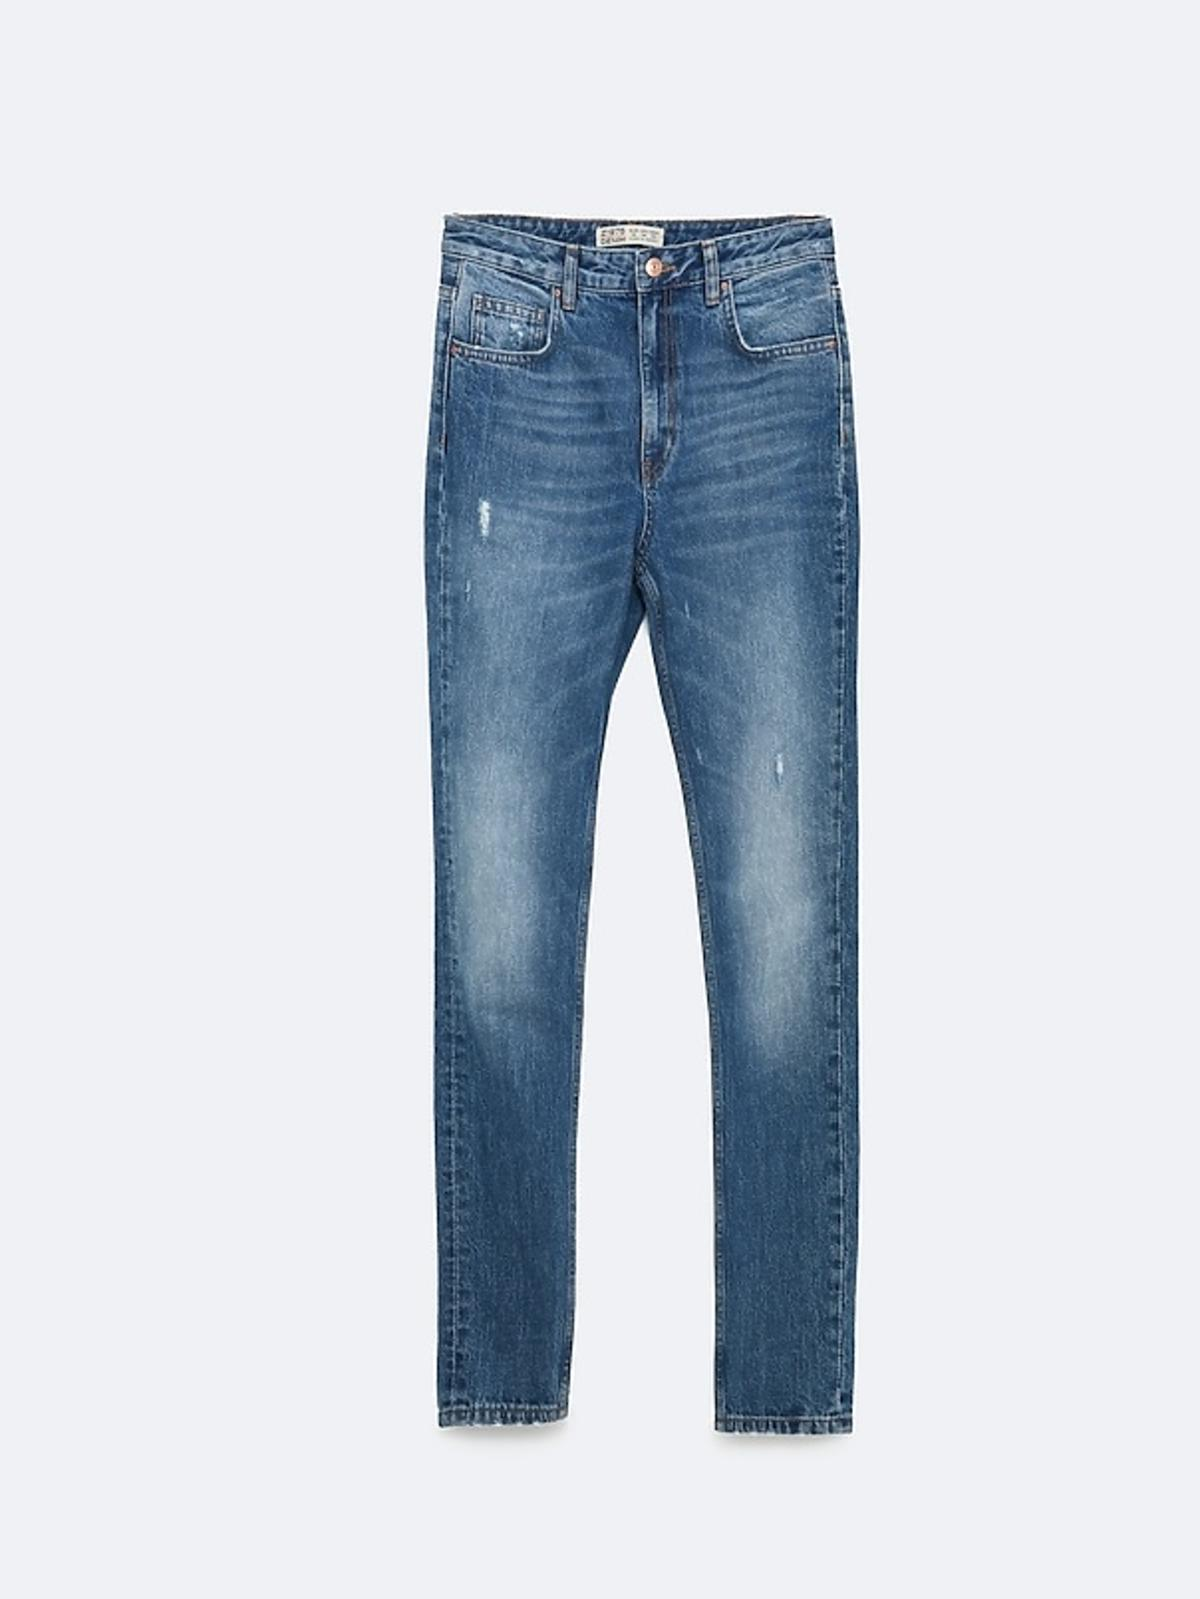 Spodnie Zara, 139 zł